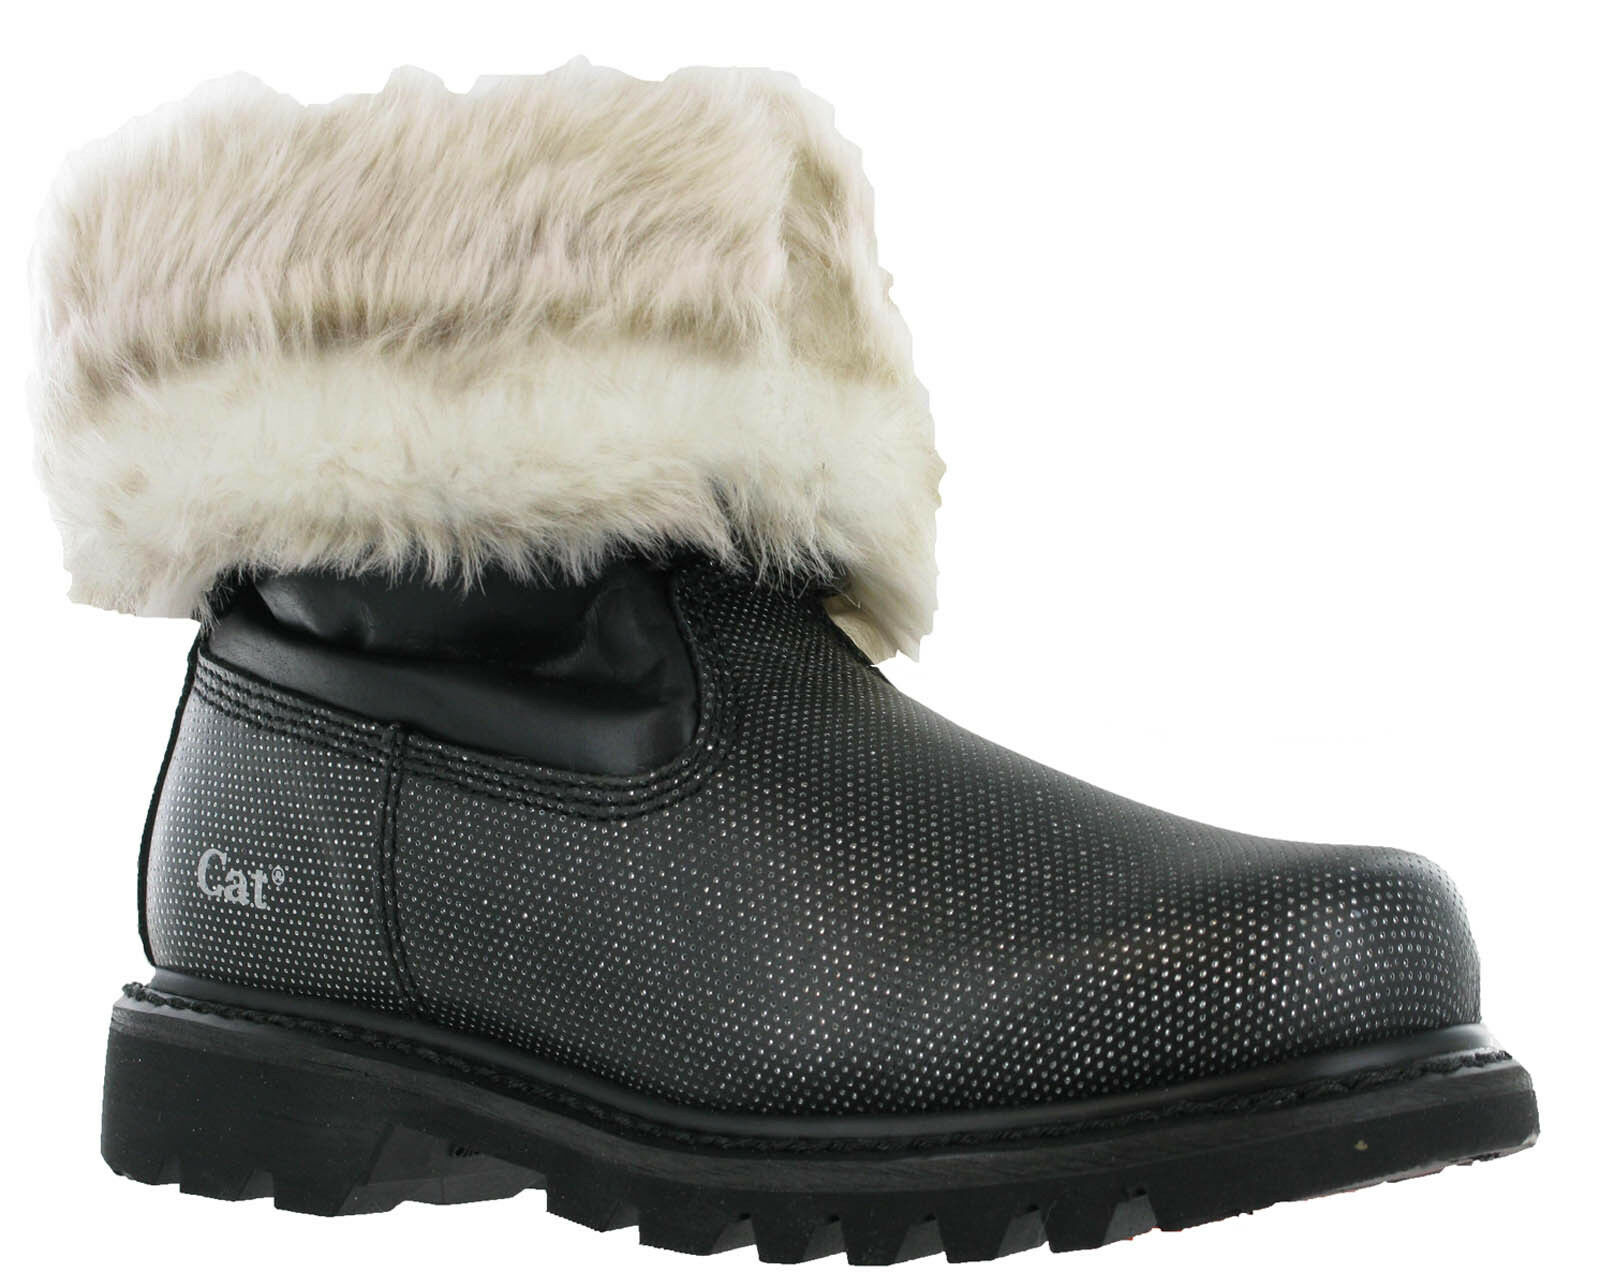 Caterpillar Bruiser Scrunch Fur Black Silver Slip UK3-4 On Womens Fashion Boots UK3-4 Slip ff31d0